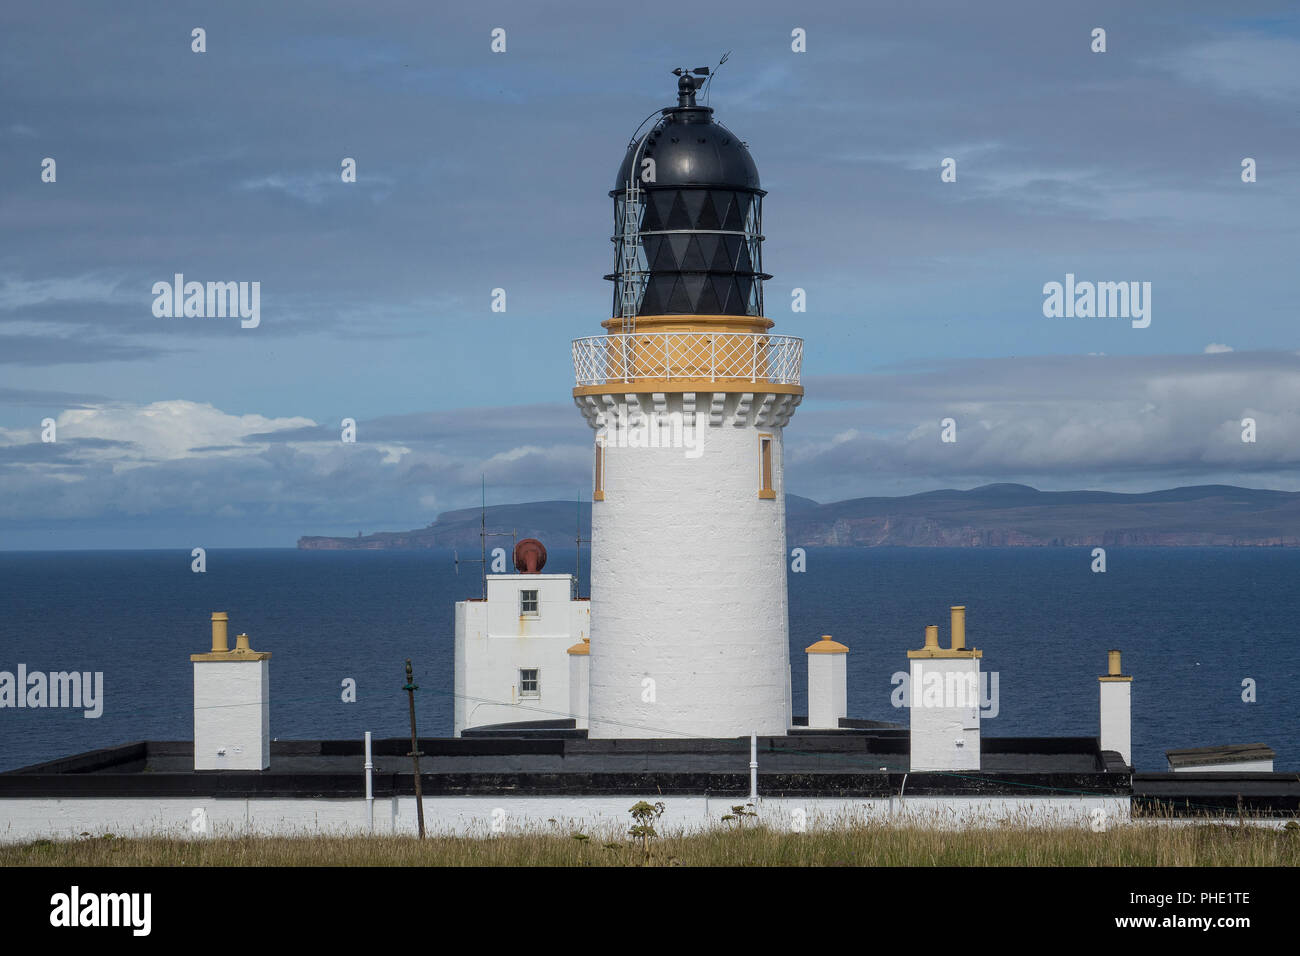 Scotland, Highlands, Caithness, Dunnet Head Lighthouse - Stock Image